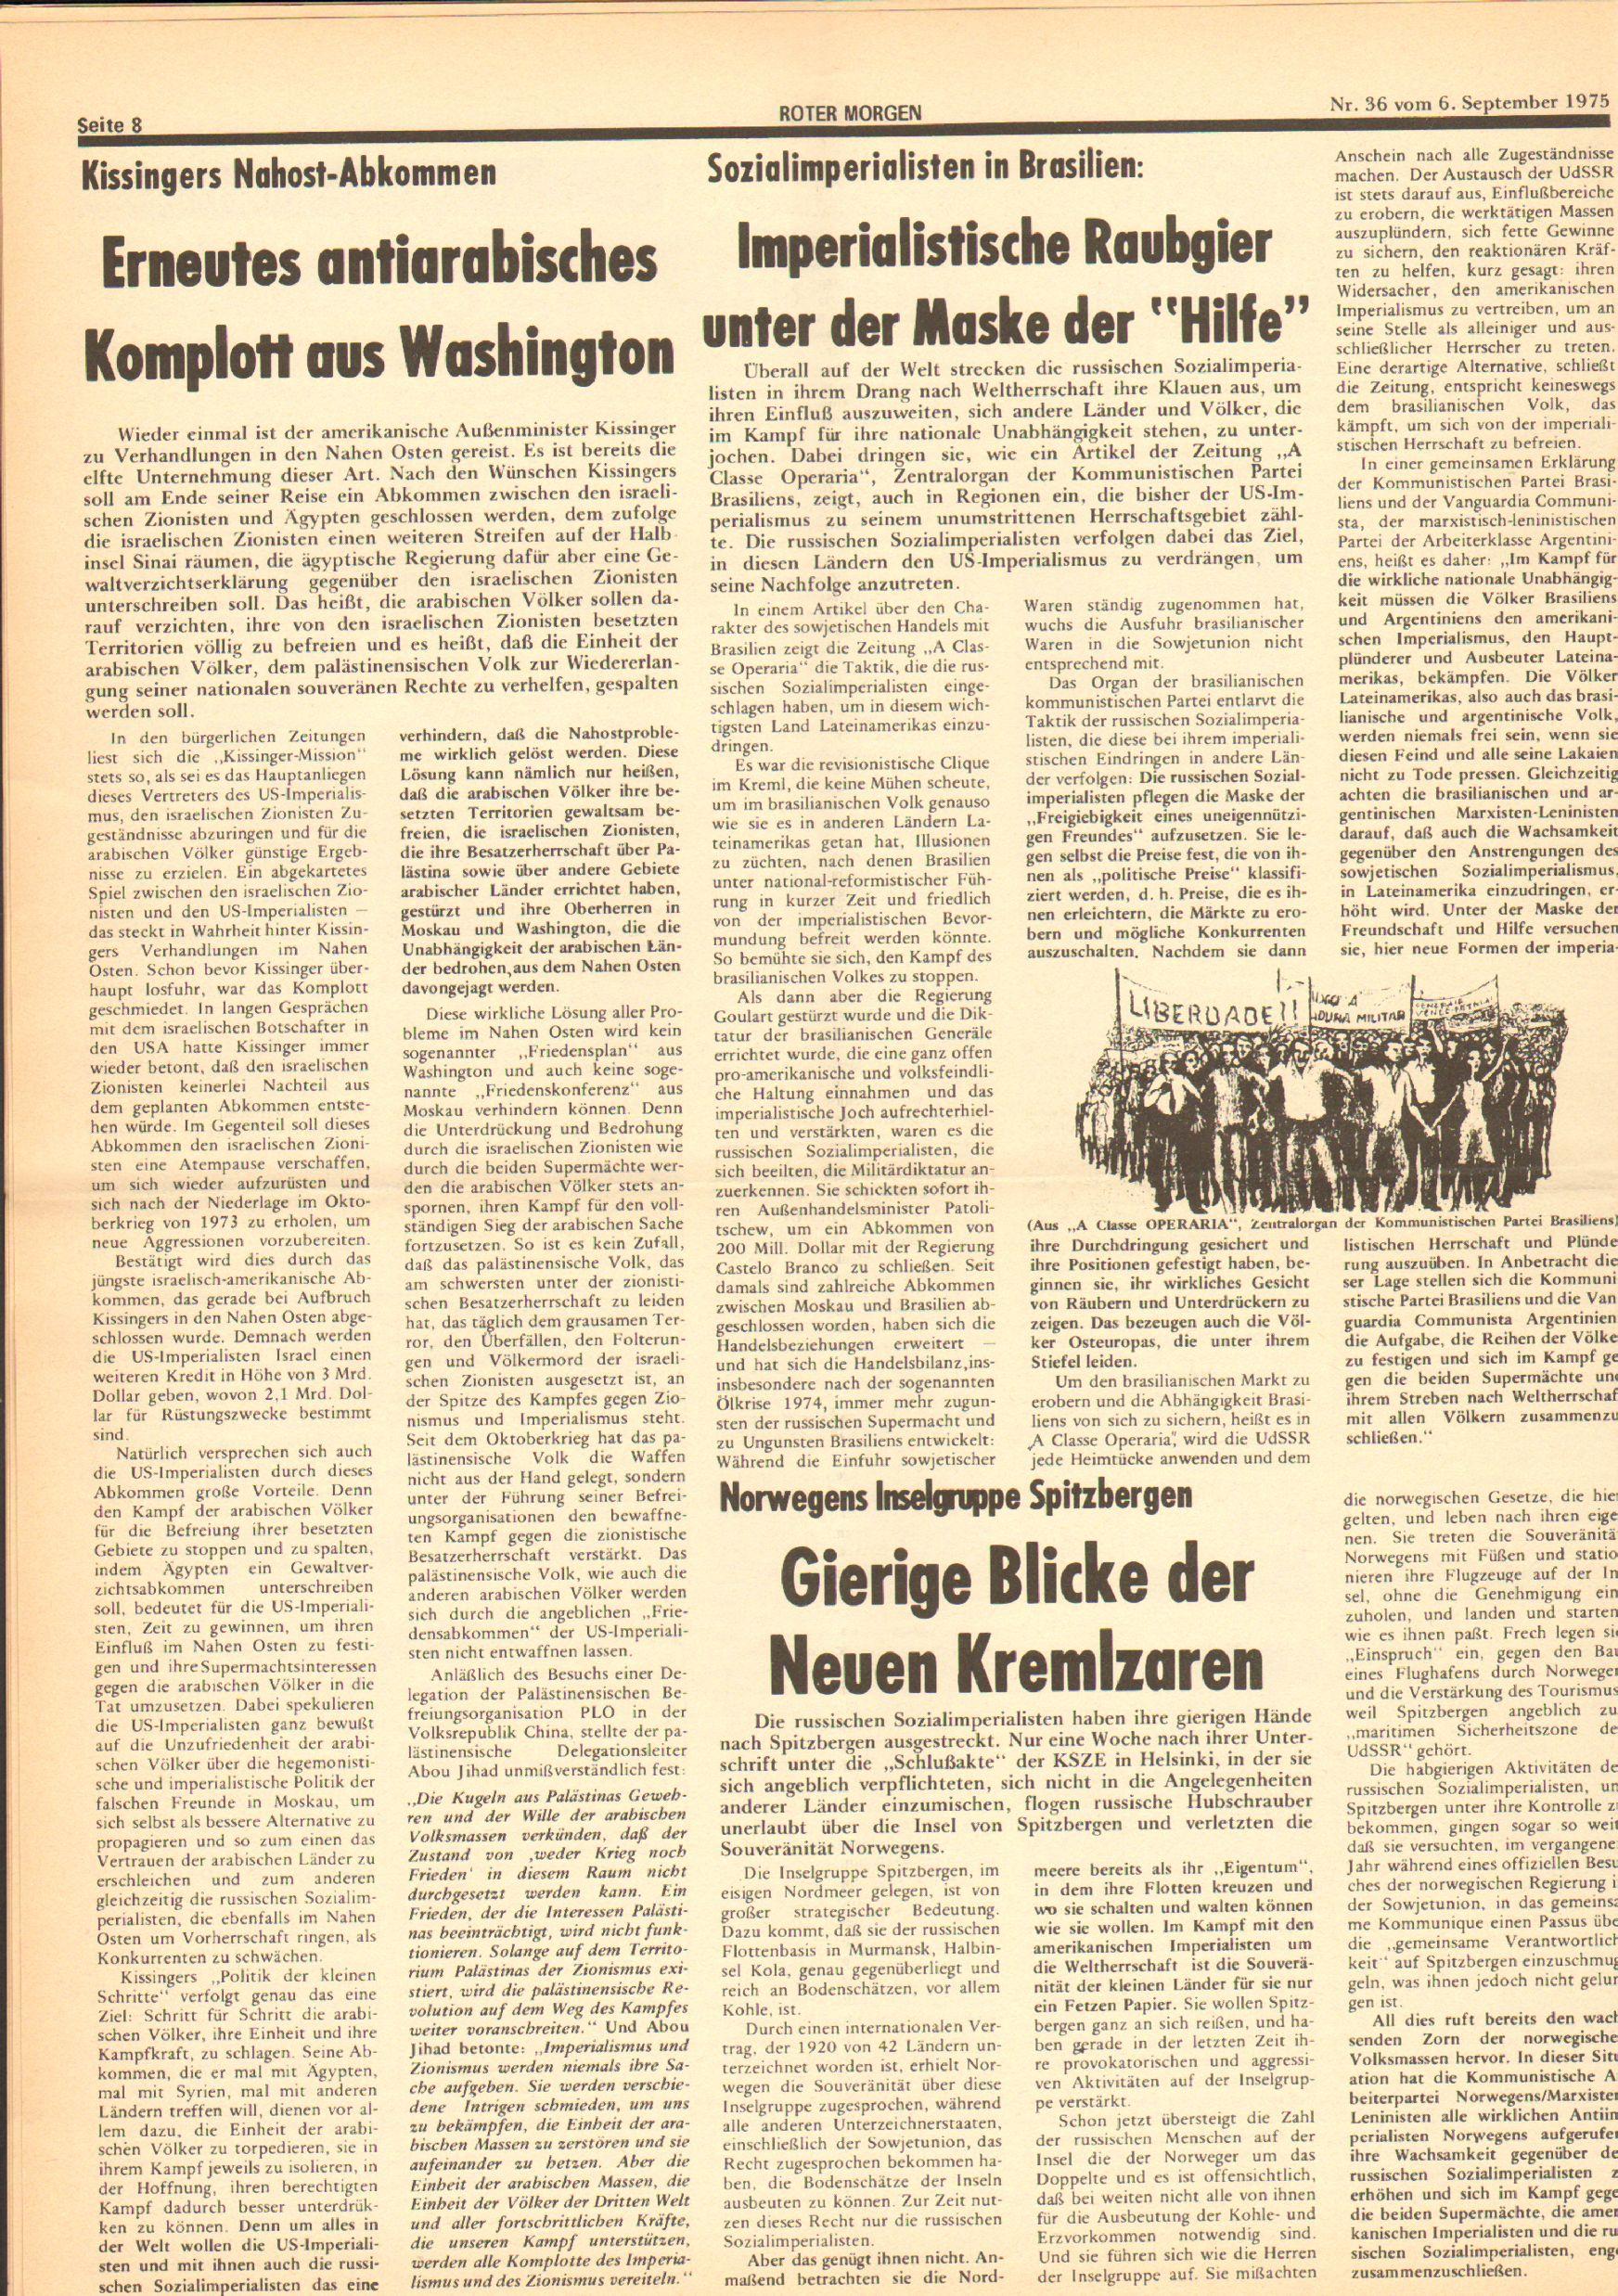 Roter Morgen, 9. Jg., 6. September 1975, Nr. 36, Seite 8